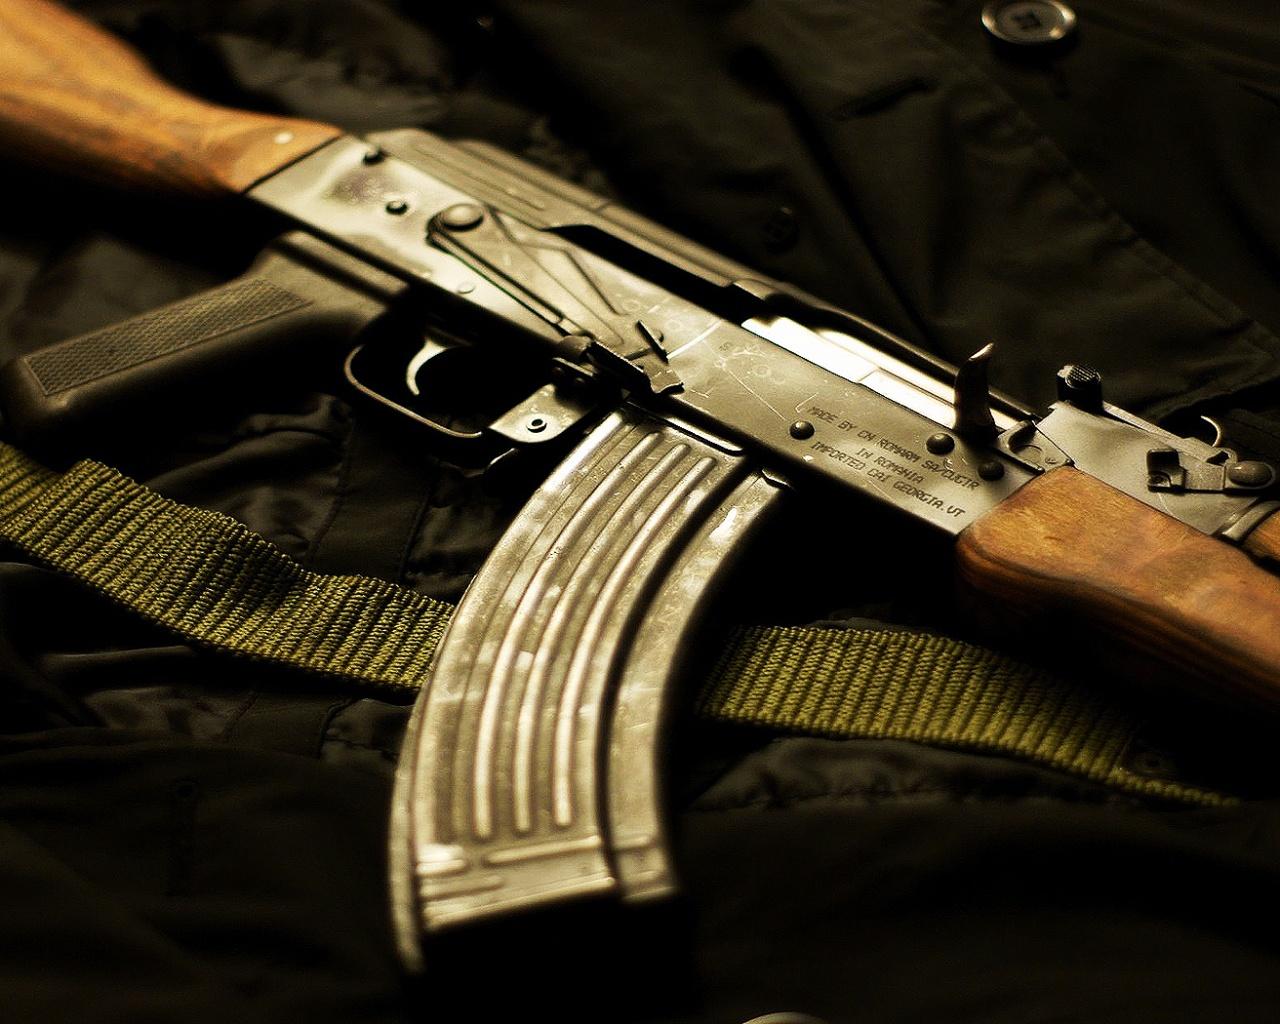 http://2.bp.blogspot.com/-sbN7yD7n1RE/Tdwl9XnG3LI/AAAAAAAACLQ/Mxk49dv3ptA/s1600/Kalashnikov_.jpg